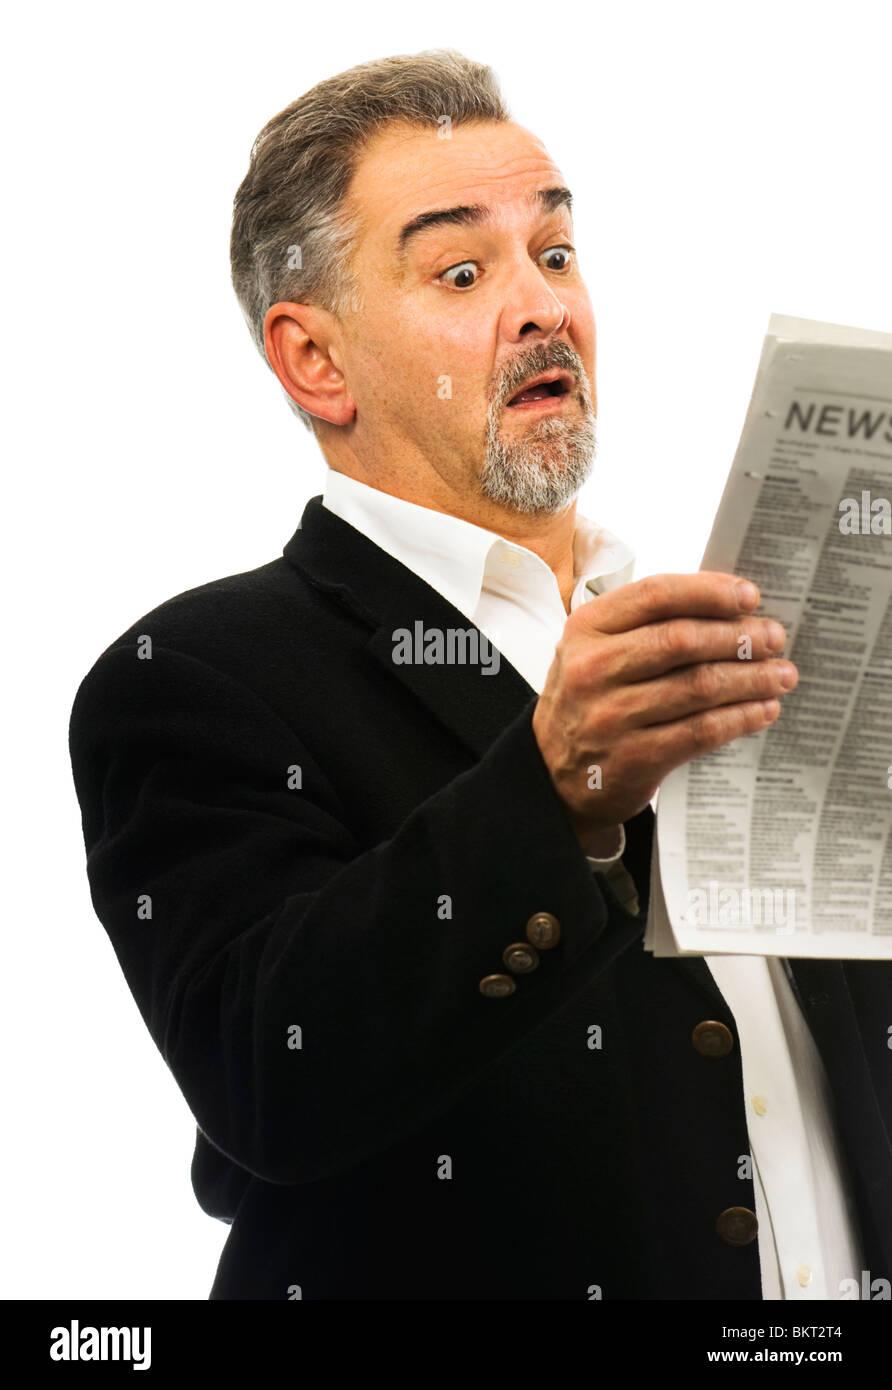 Newspaper Surprise Stock Photos & Newspaper Surprise Stock